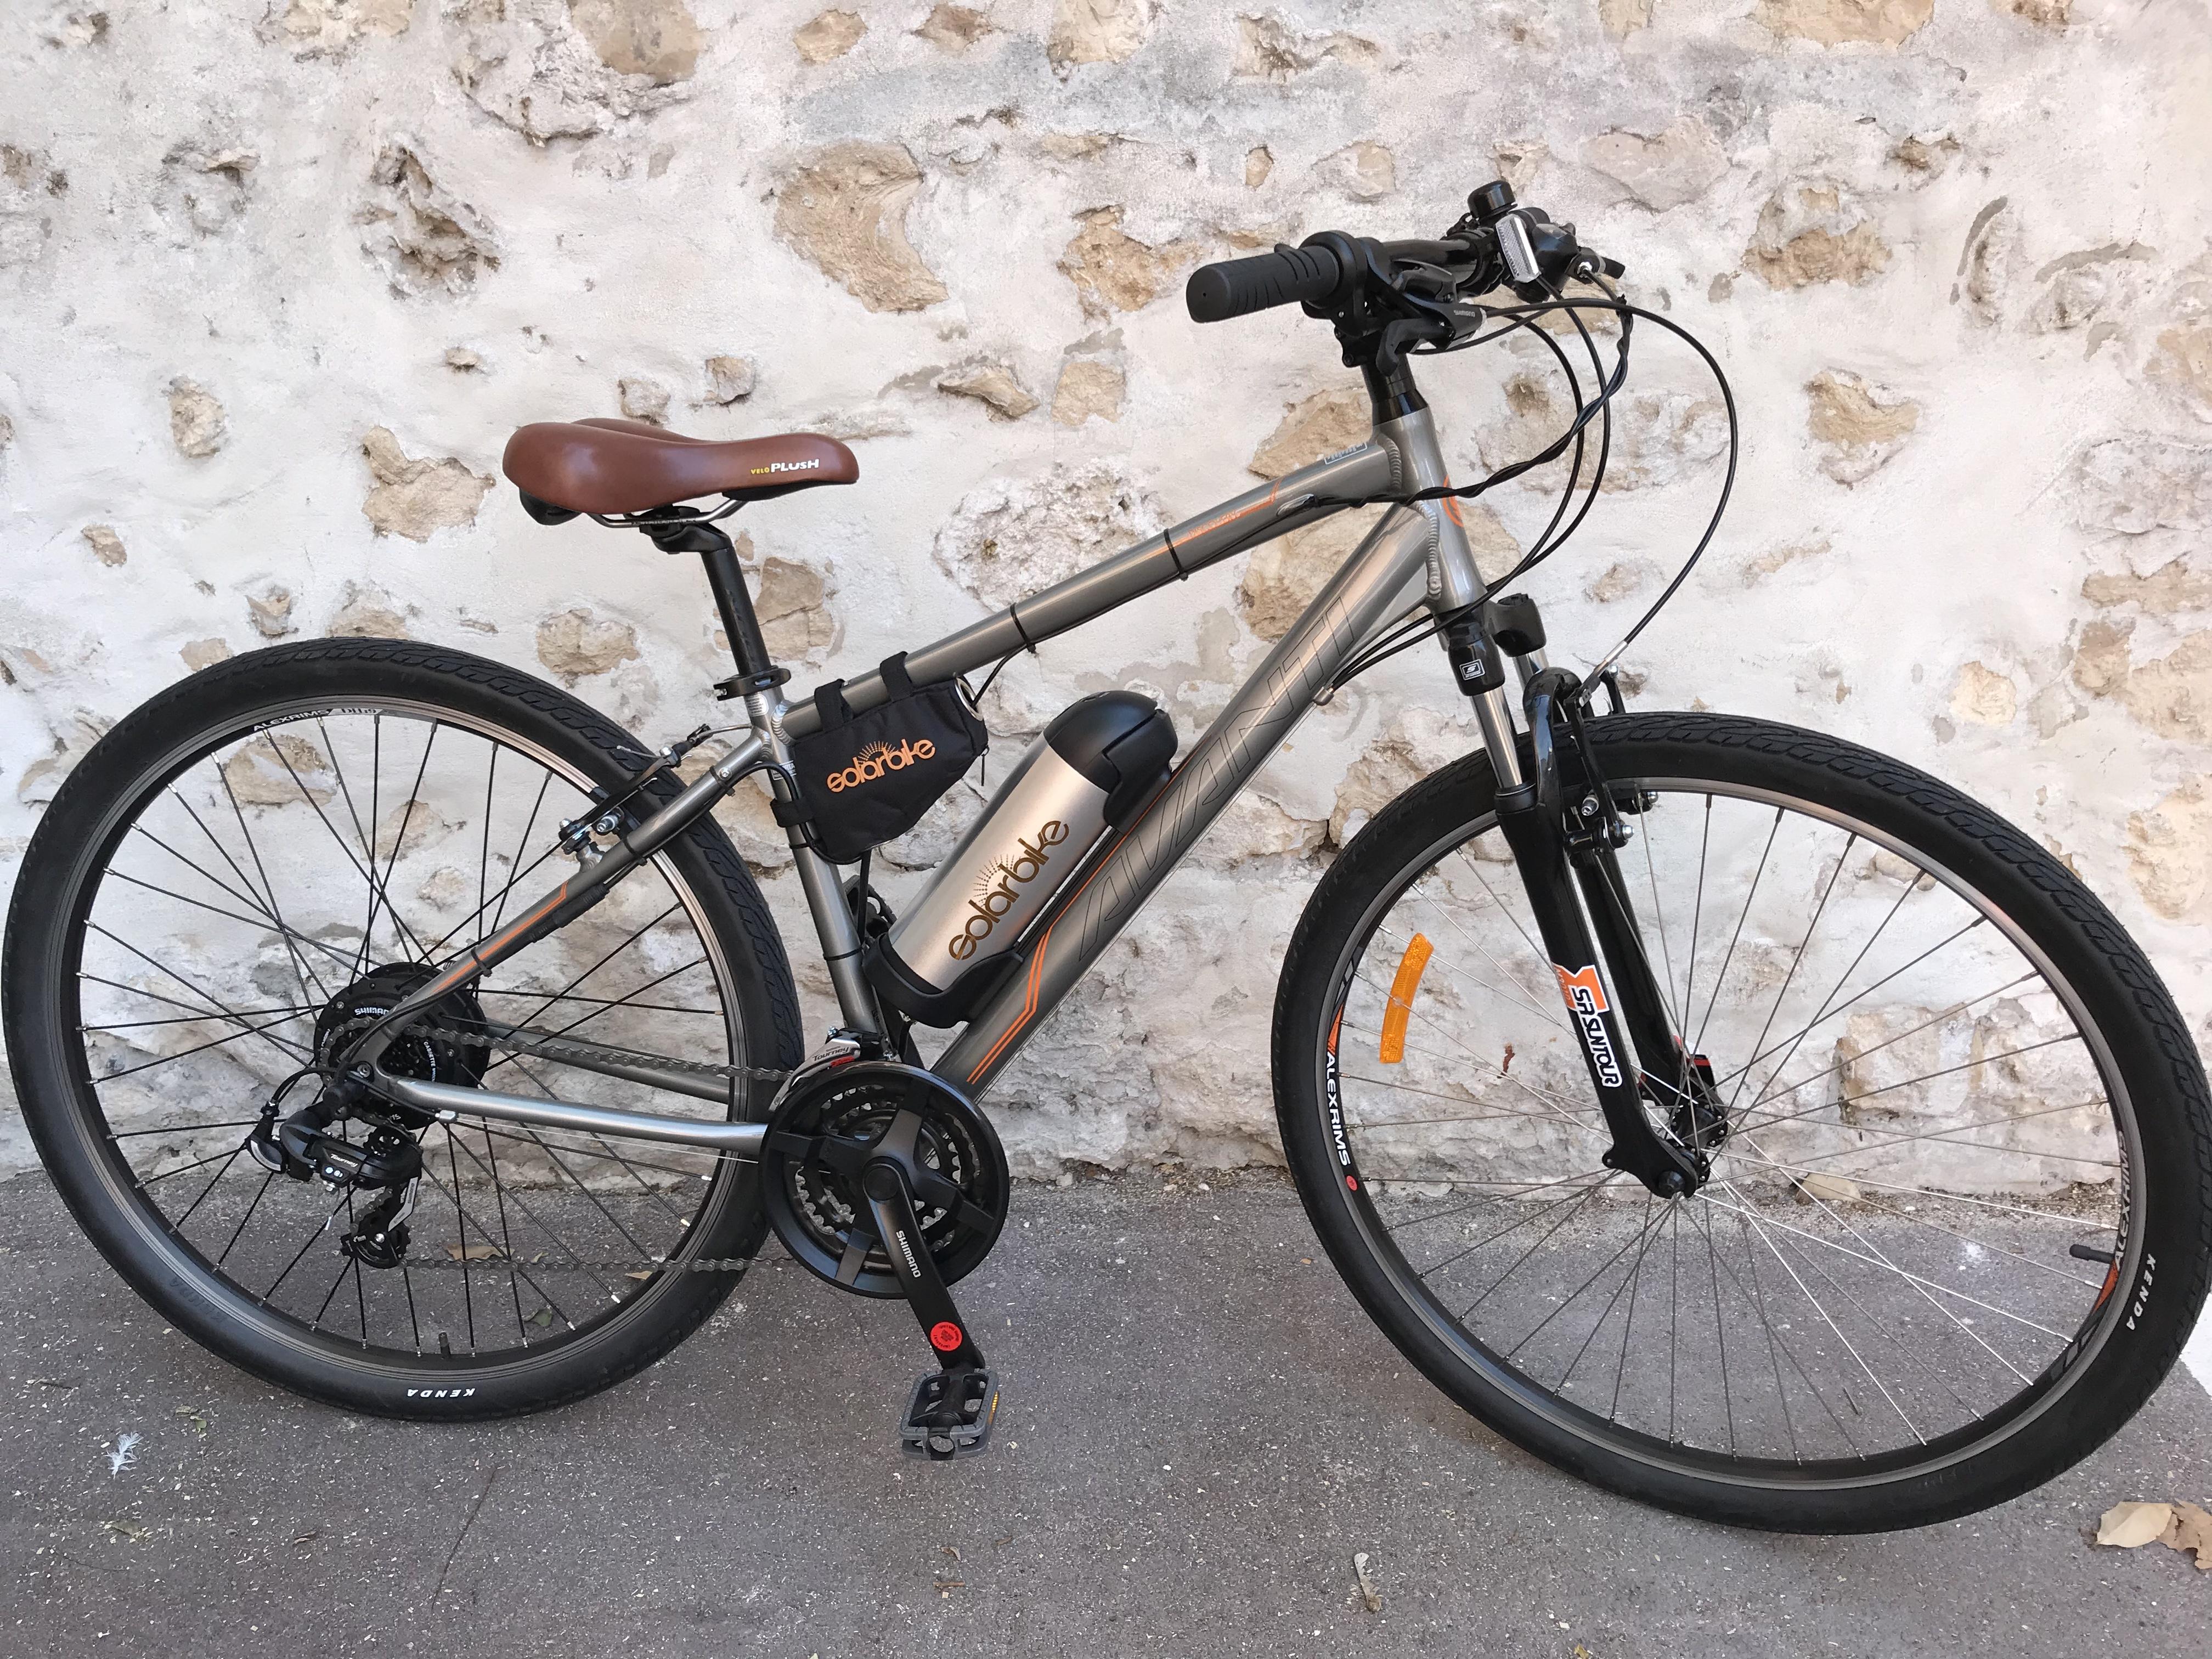 SOLAR BIKE - SOLAR BIKE is an Australian Electric Bicycle